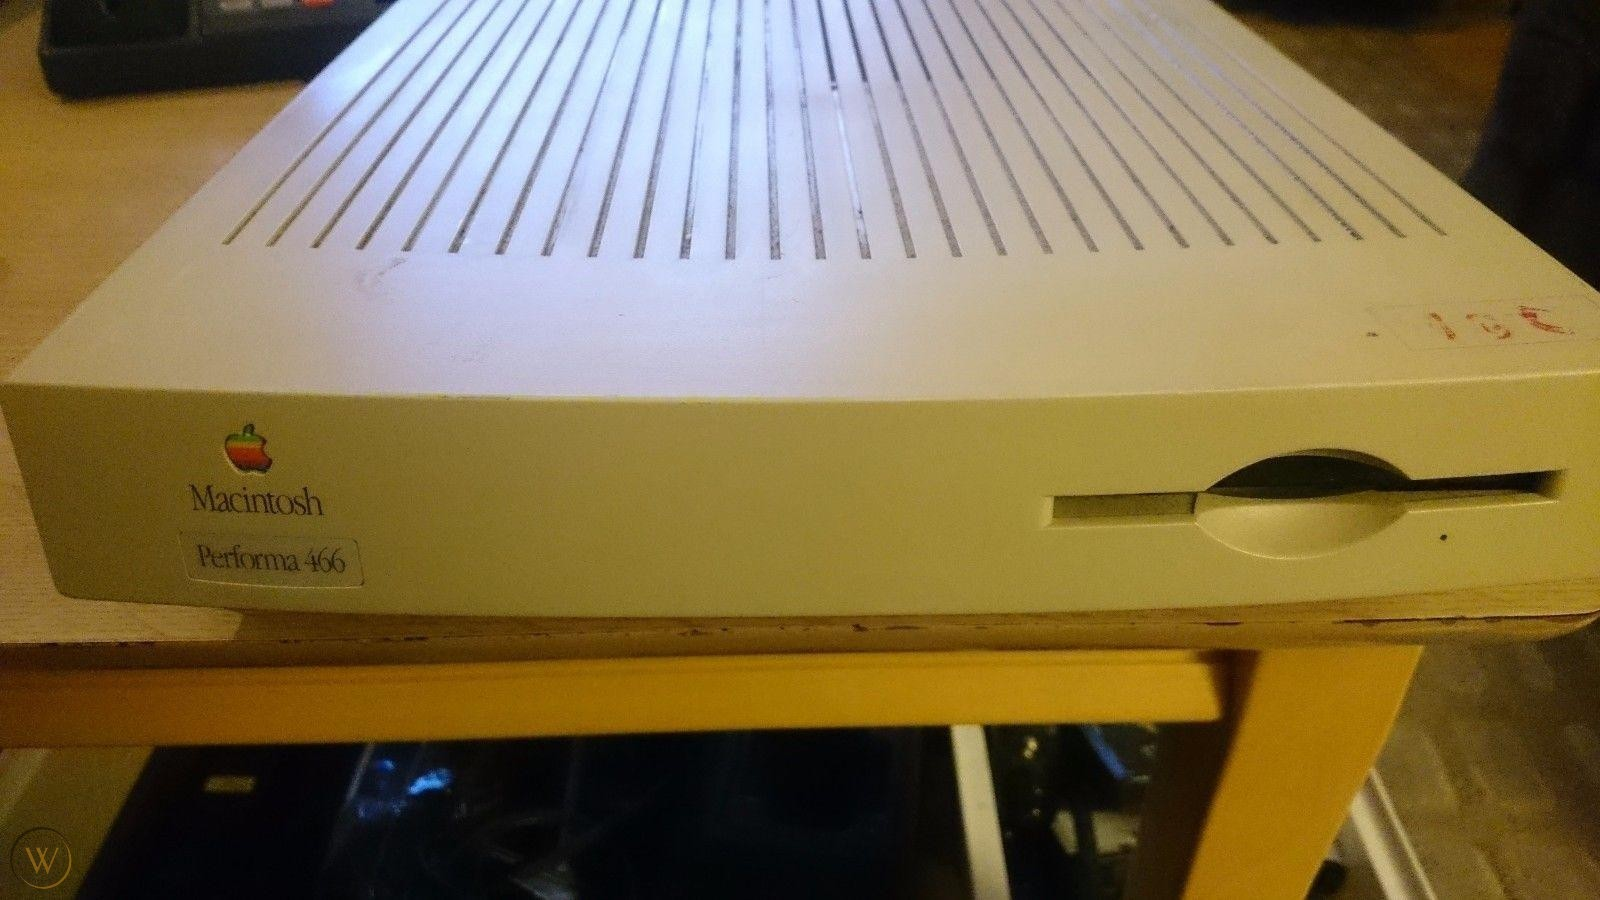 Macintosh Performa 466